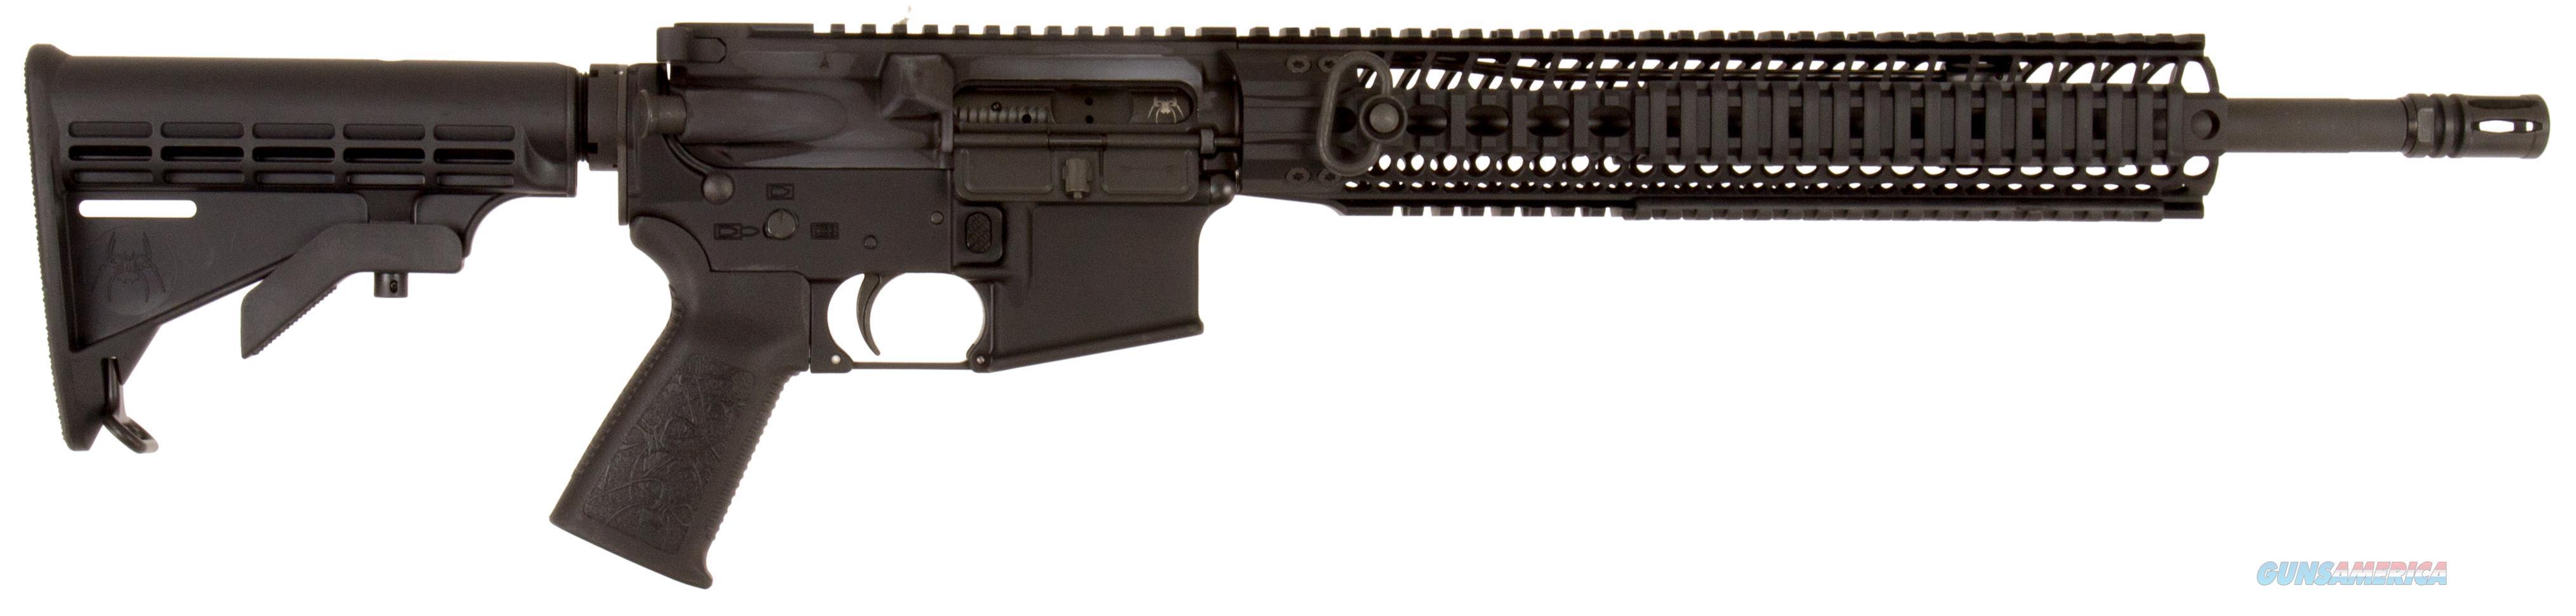 "Spikes Str5035r2s St-15 Le Mid Length With 12"" Bar2 Rail Semi-Automatic 223 Remington/5.56 Nato 16"" No Magazine 6-Position Black Stk Black Hard Coat Anodized STR5035-R2S  Guns > Rifles > S Misc Rifles"